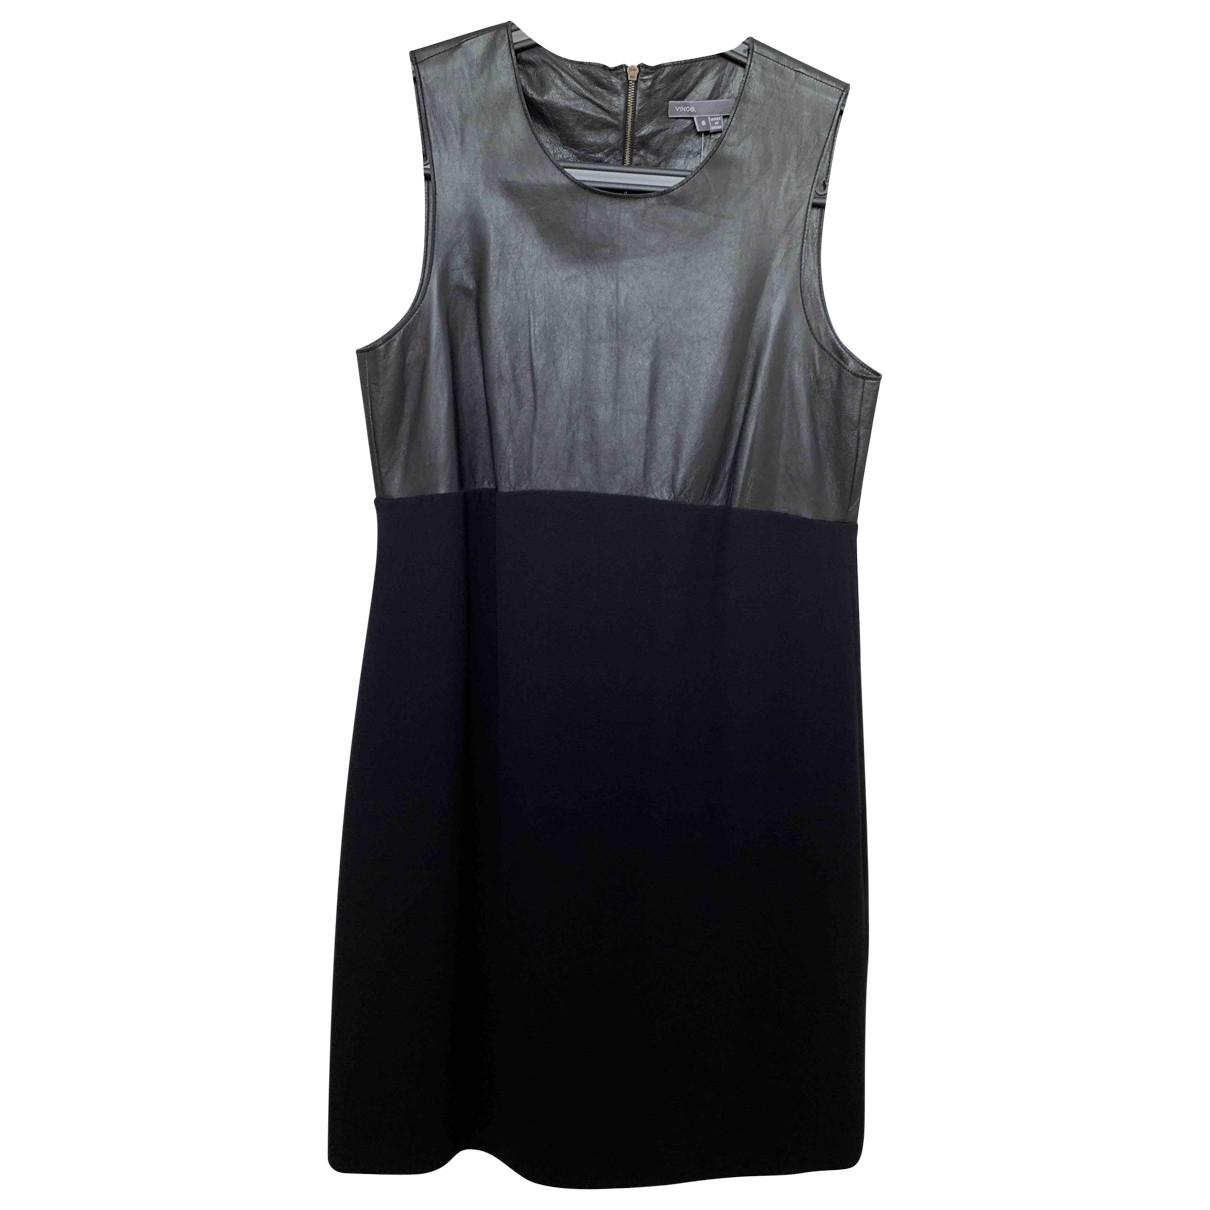 Vince \N Black Leather dress for Women 6 US